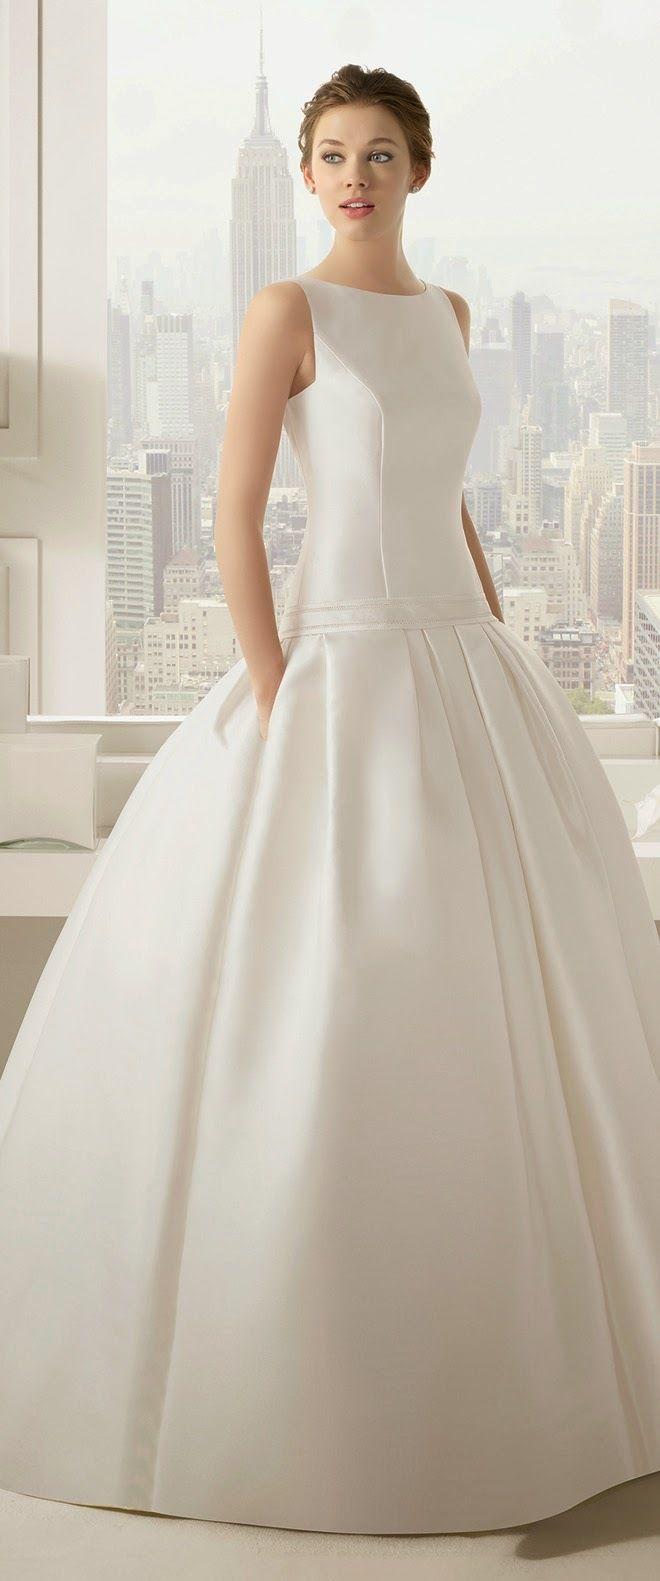 wedding dresses with pockets wedding dress with pockets Vera Wang Wedding Dresses